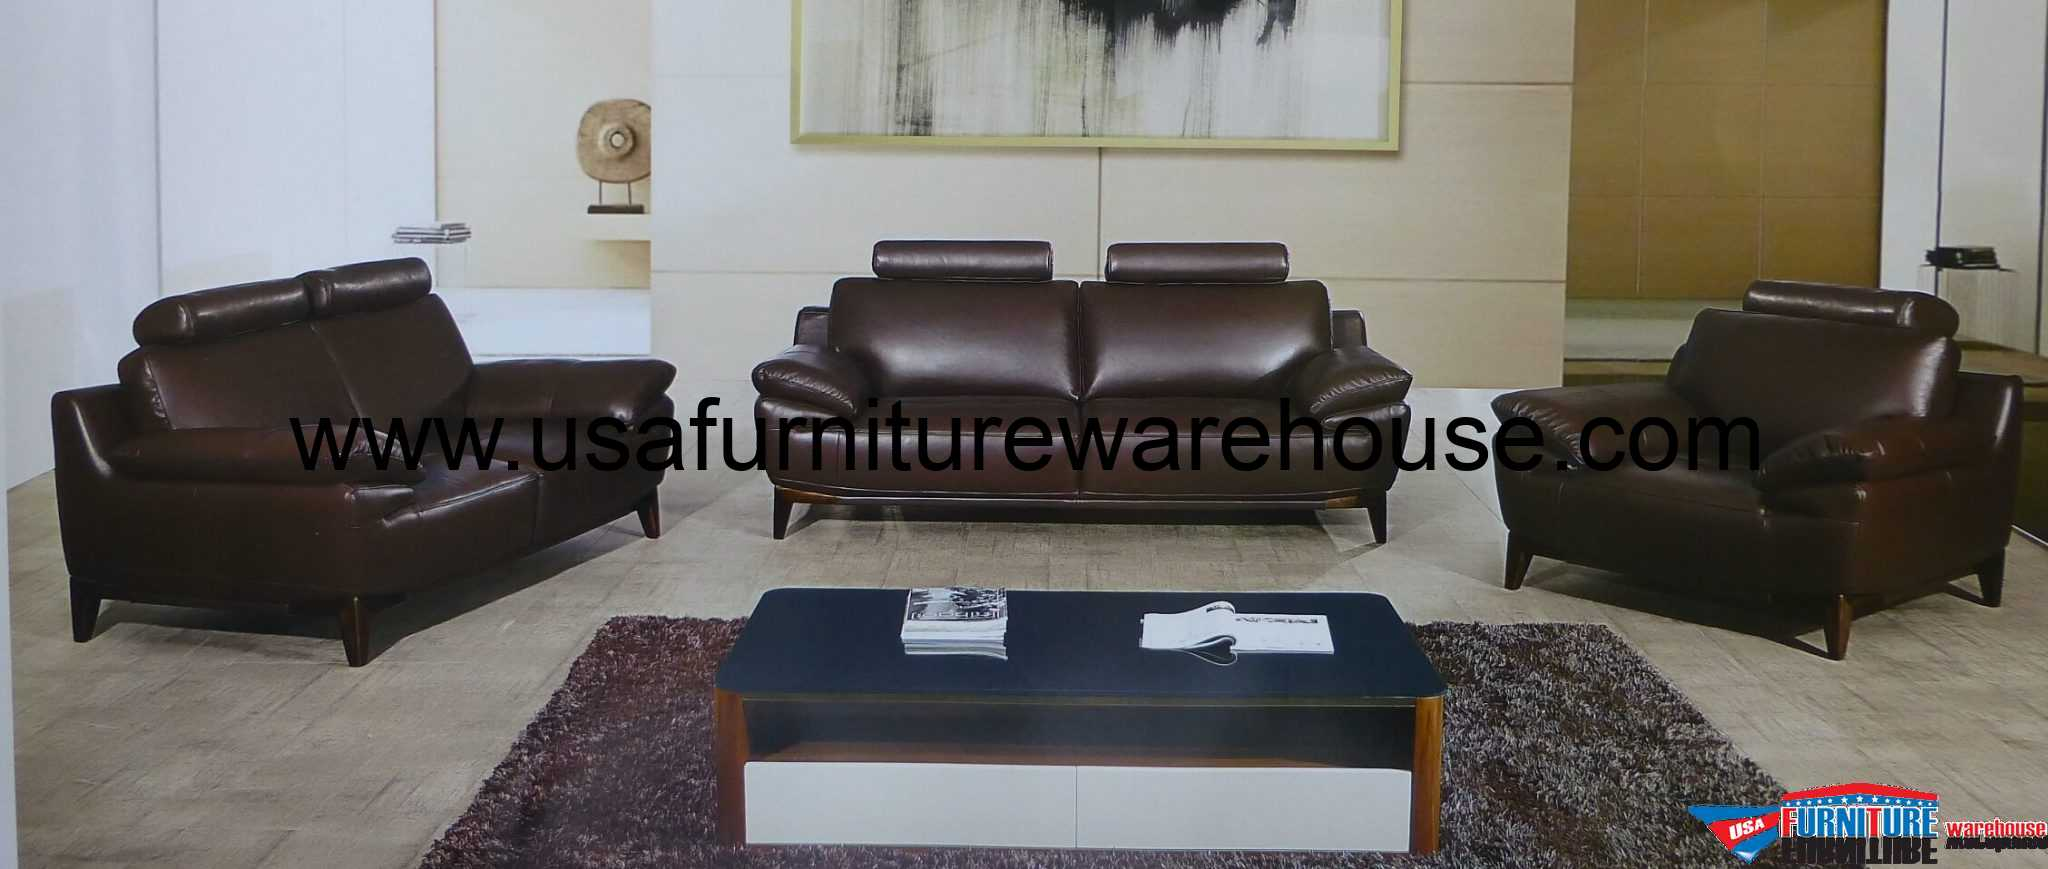 Attrayant USA Furniture Warehouse